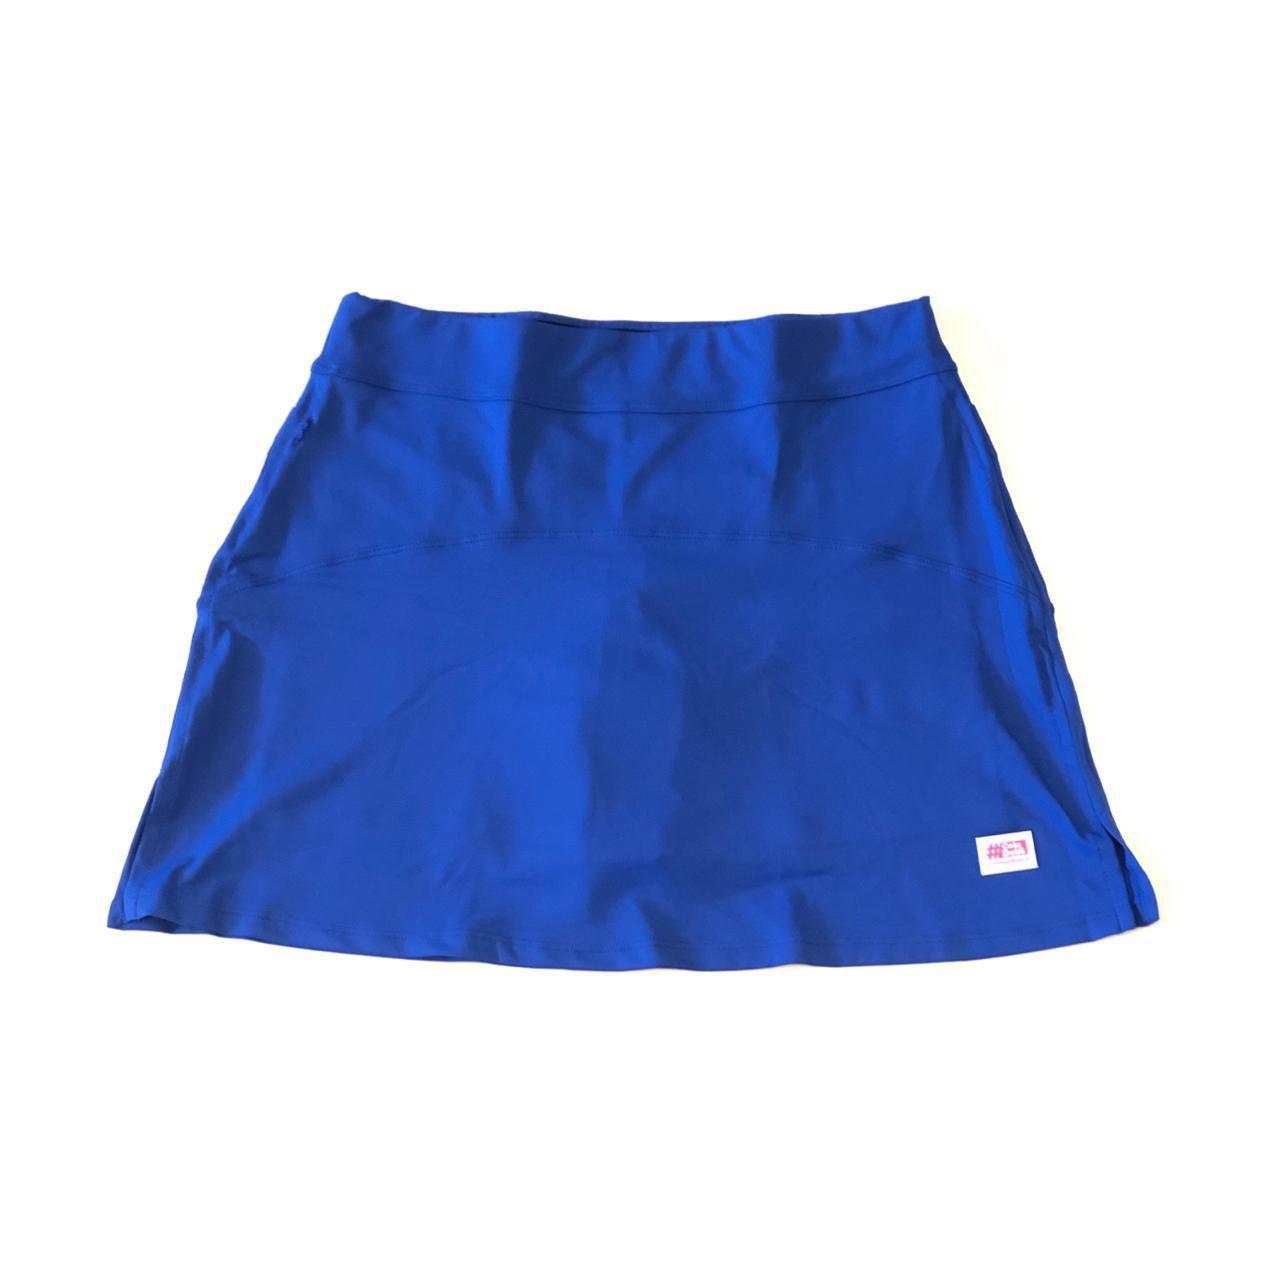 Saia fitness mil bolsos azul royal (5 bolsos)